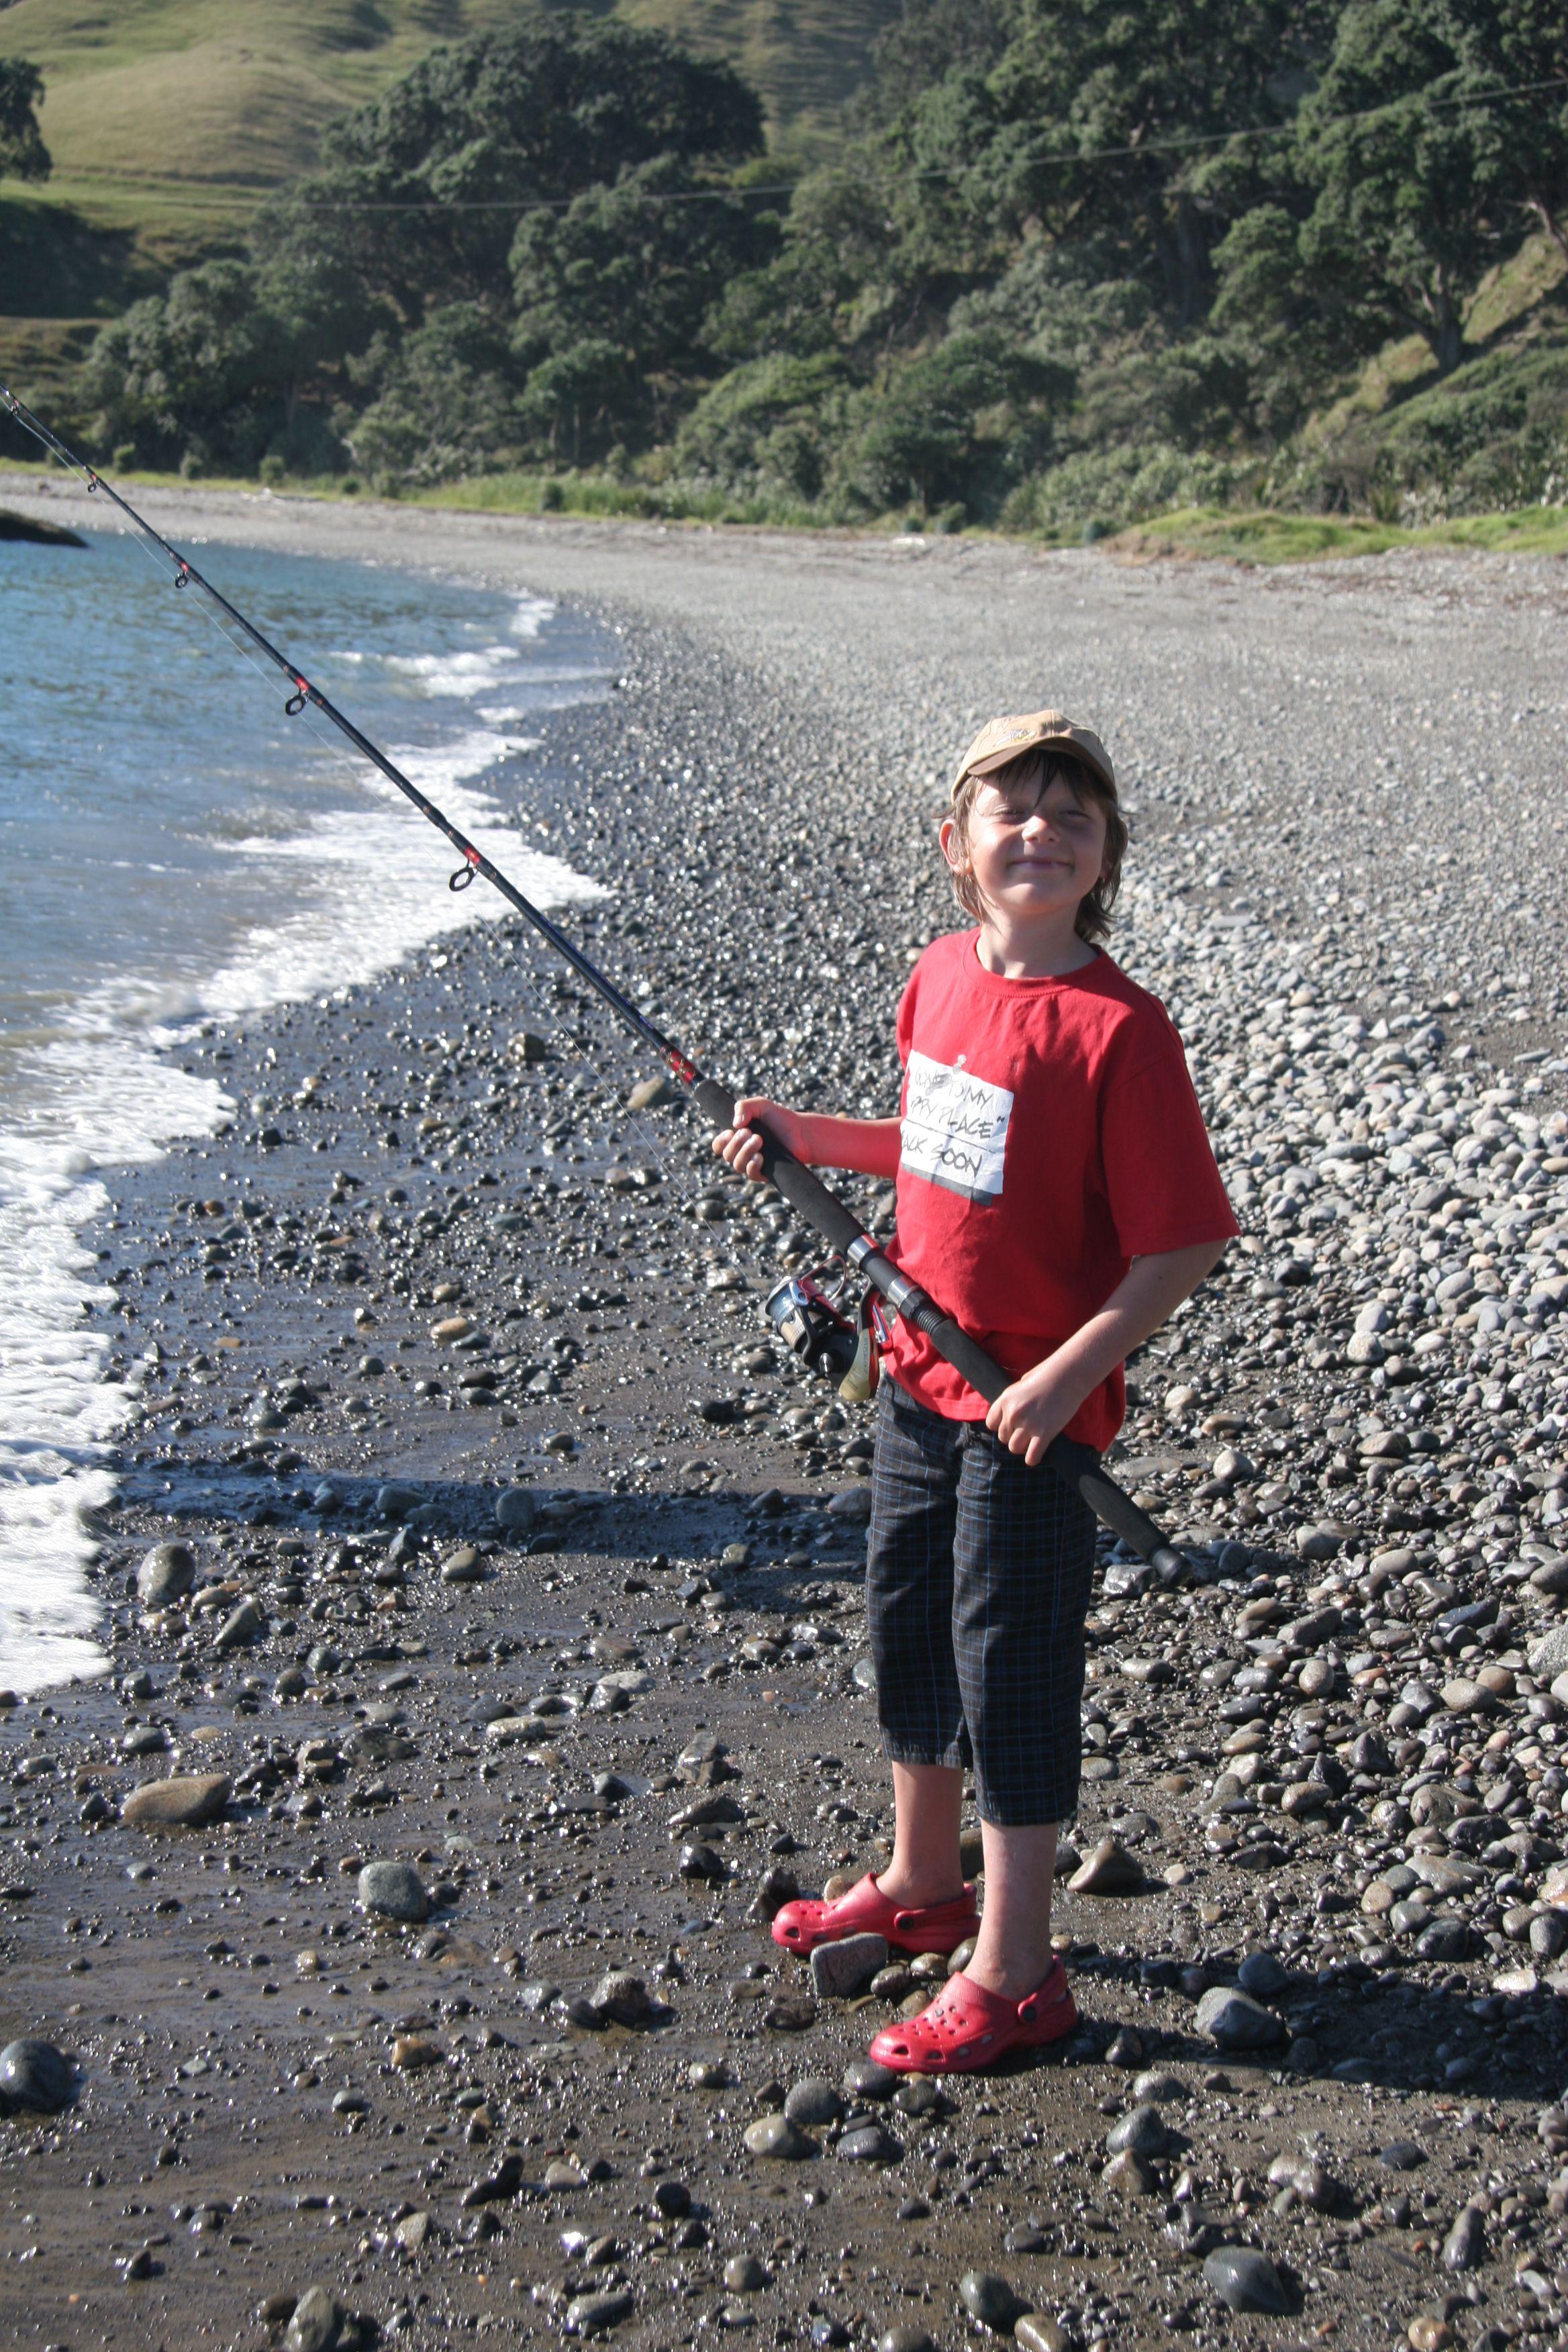 Aonghas fishing